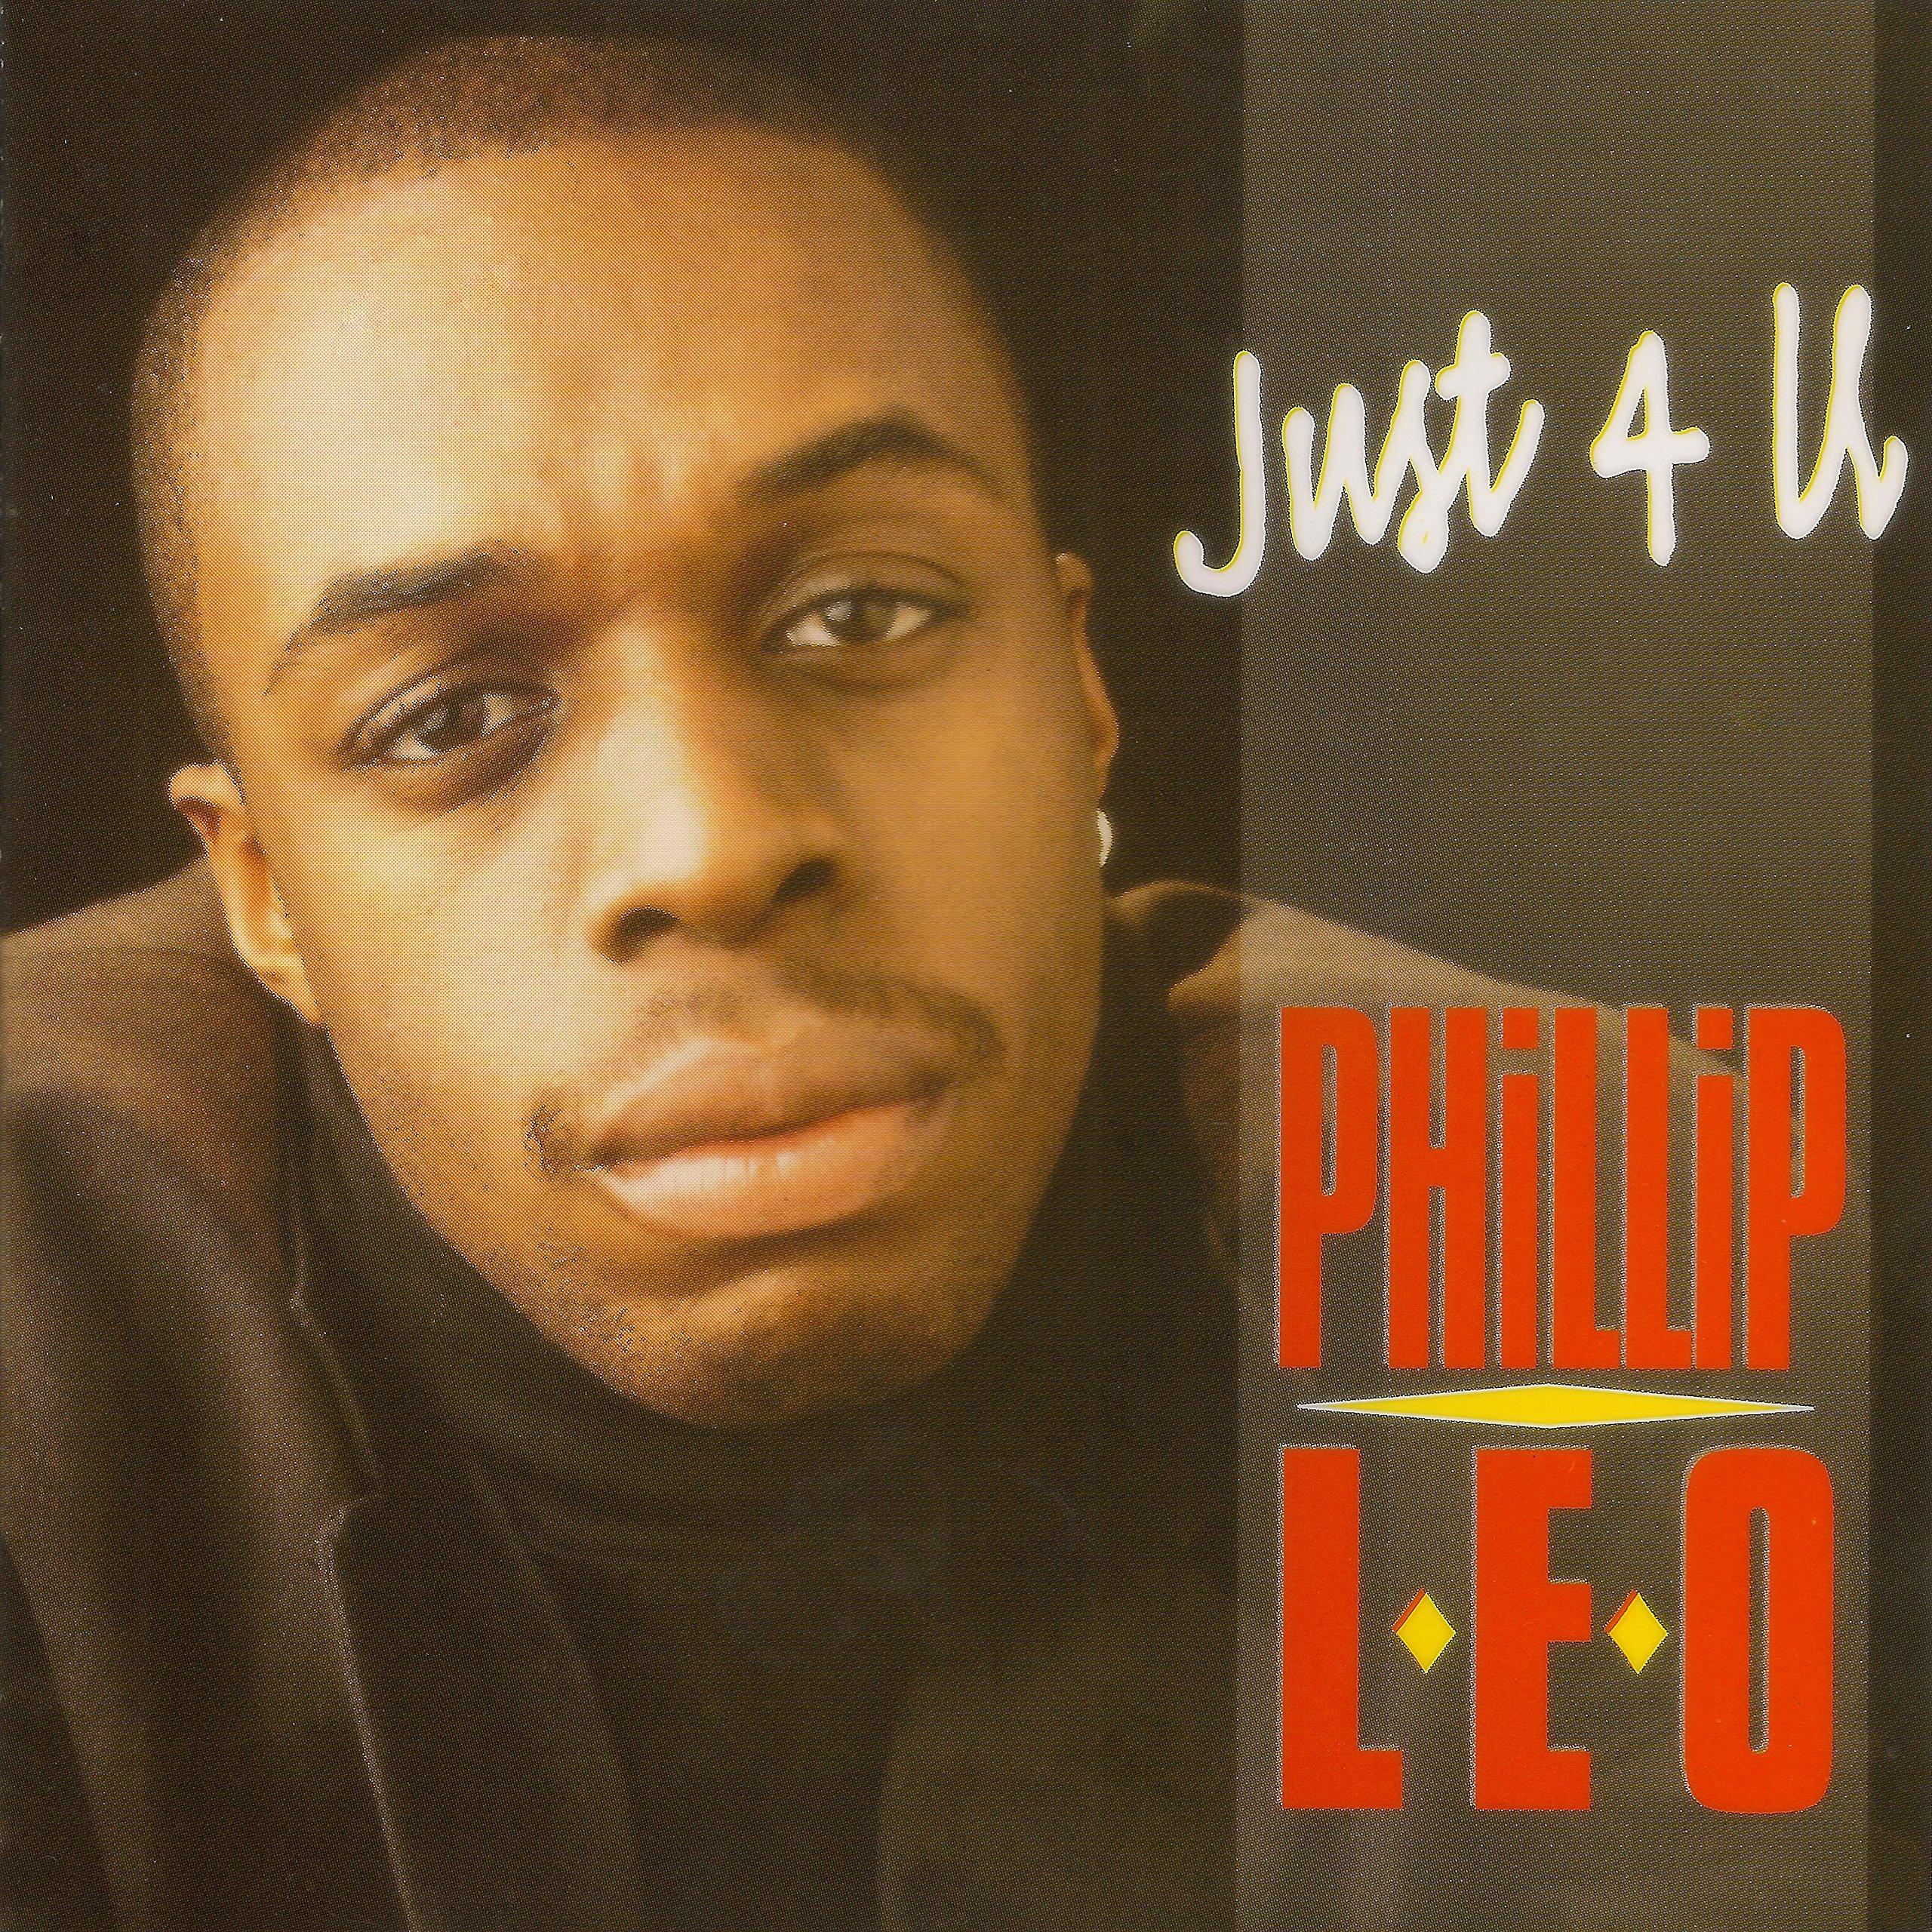 Phillip Leo – Just 4 U (1996) [FLAC]